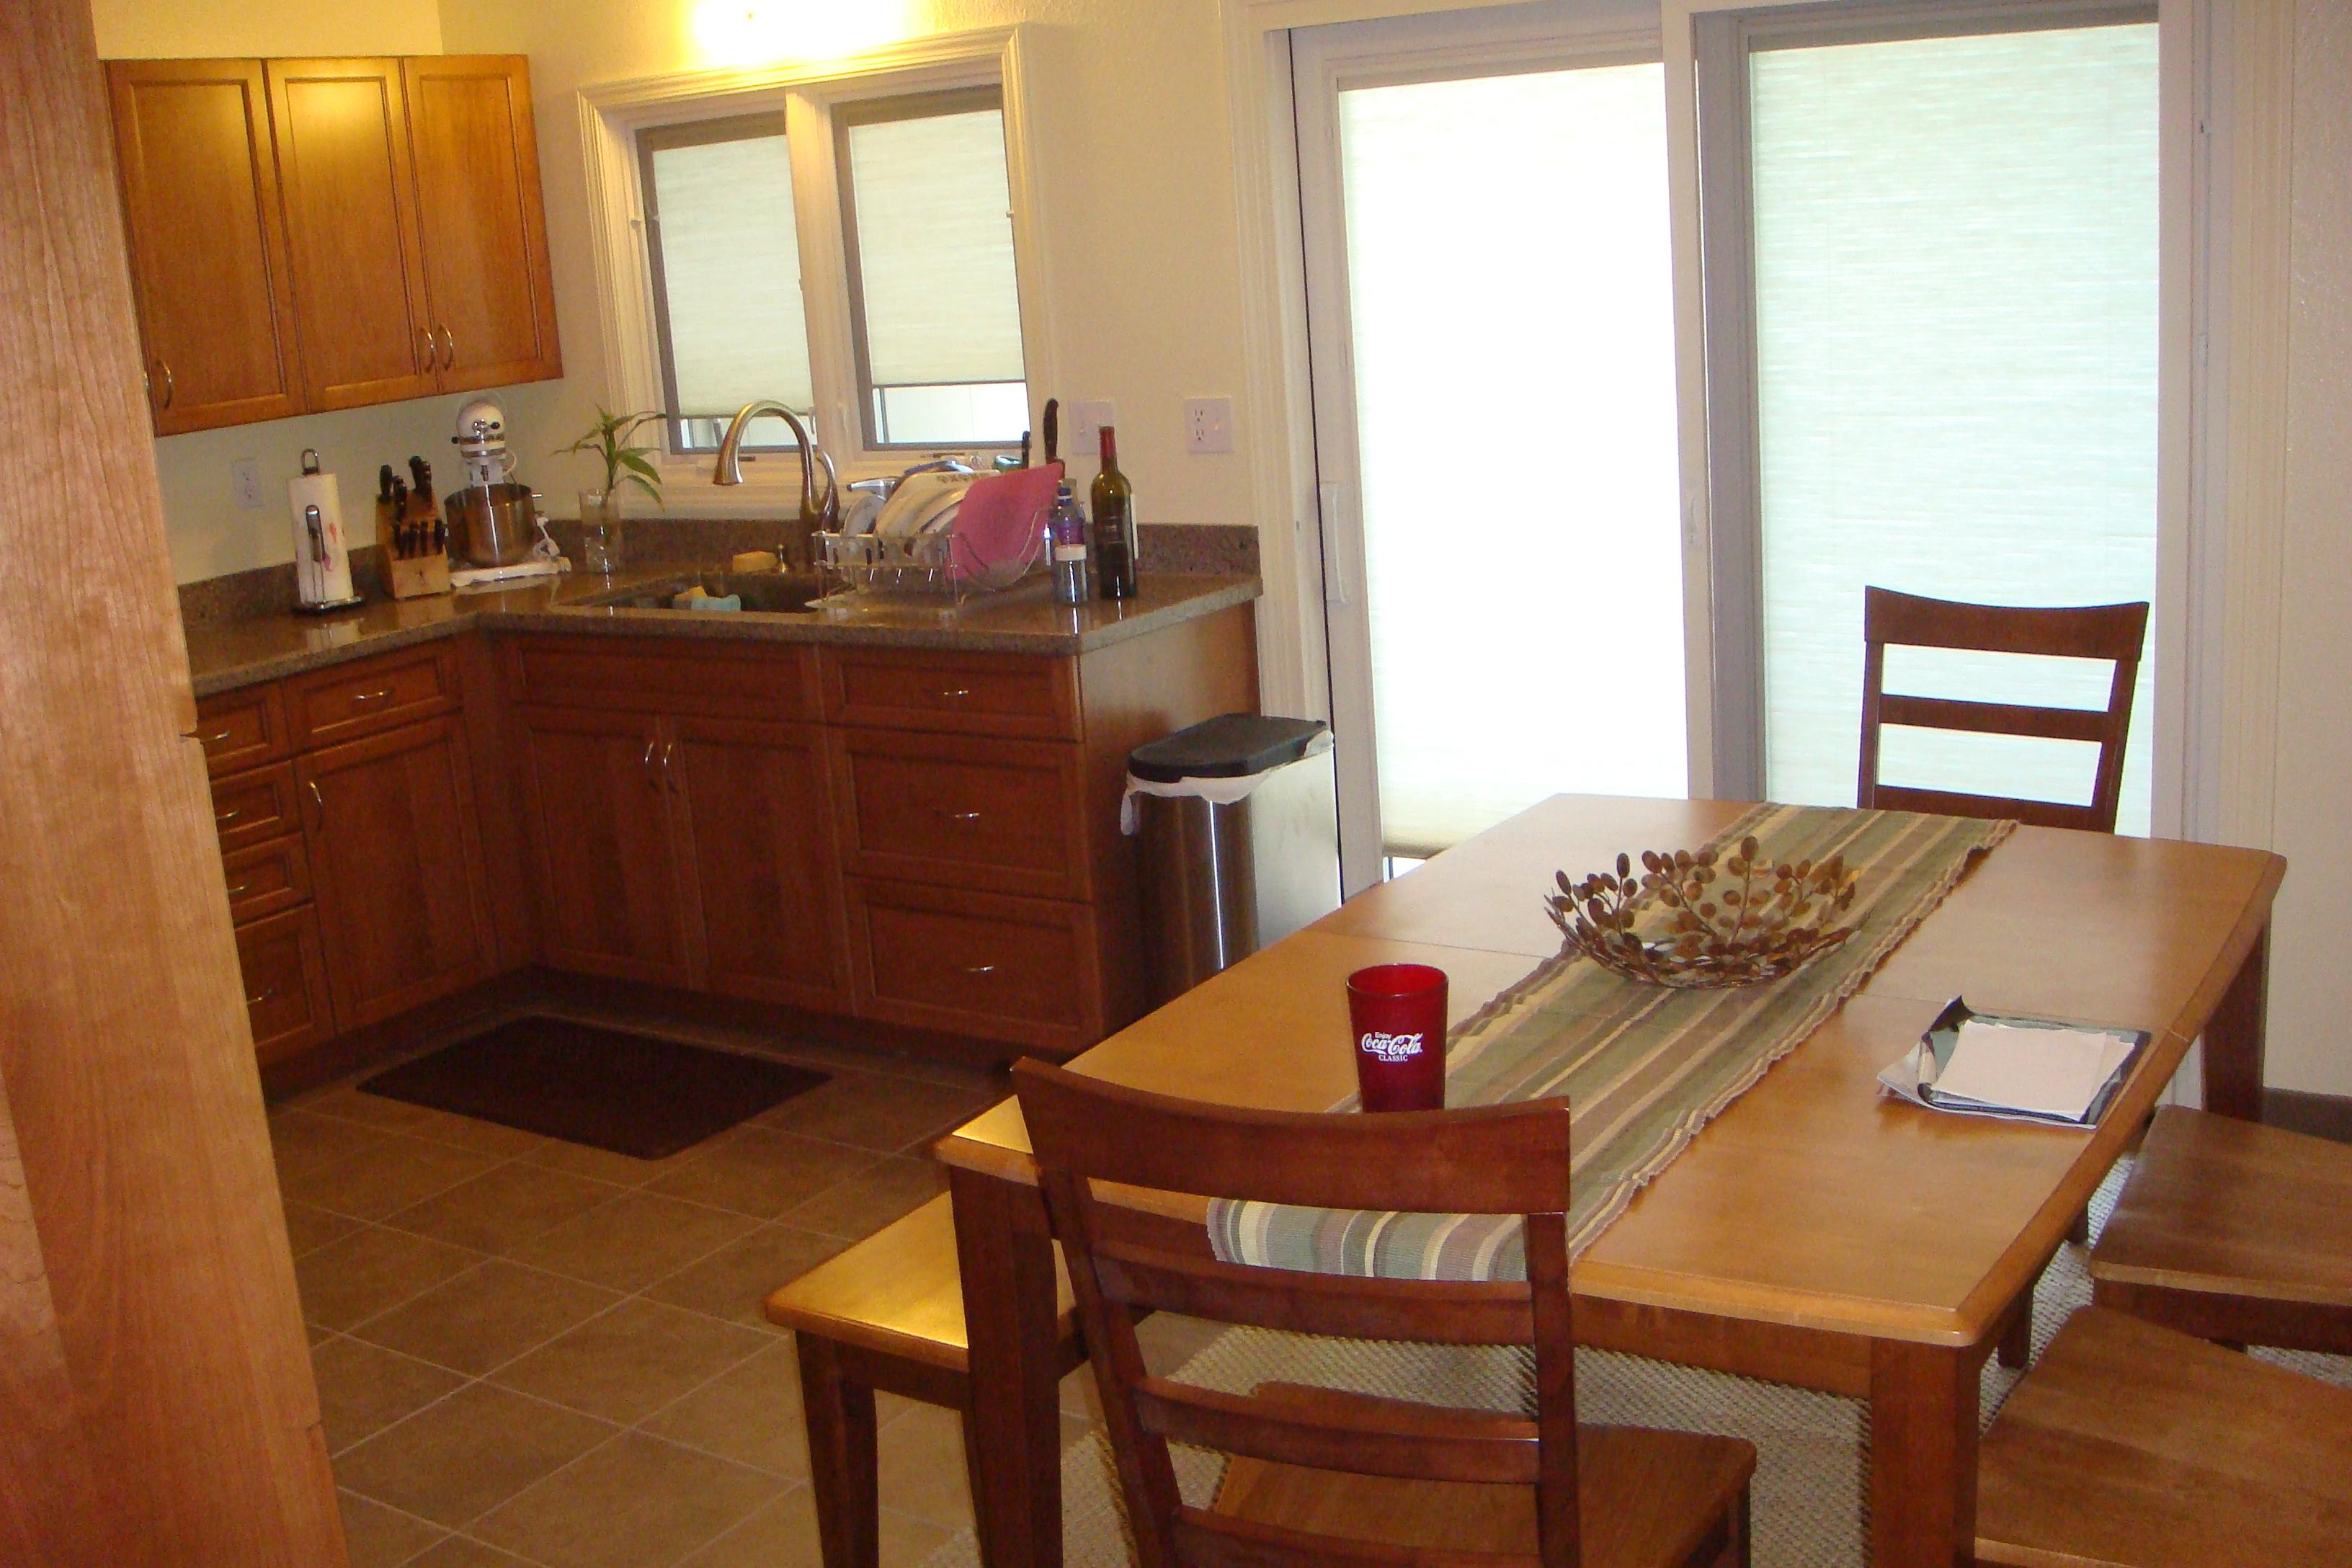 paragonbuildershawaii kitchen remodel hawaii New Town residence